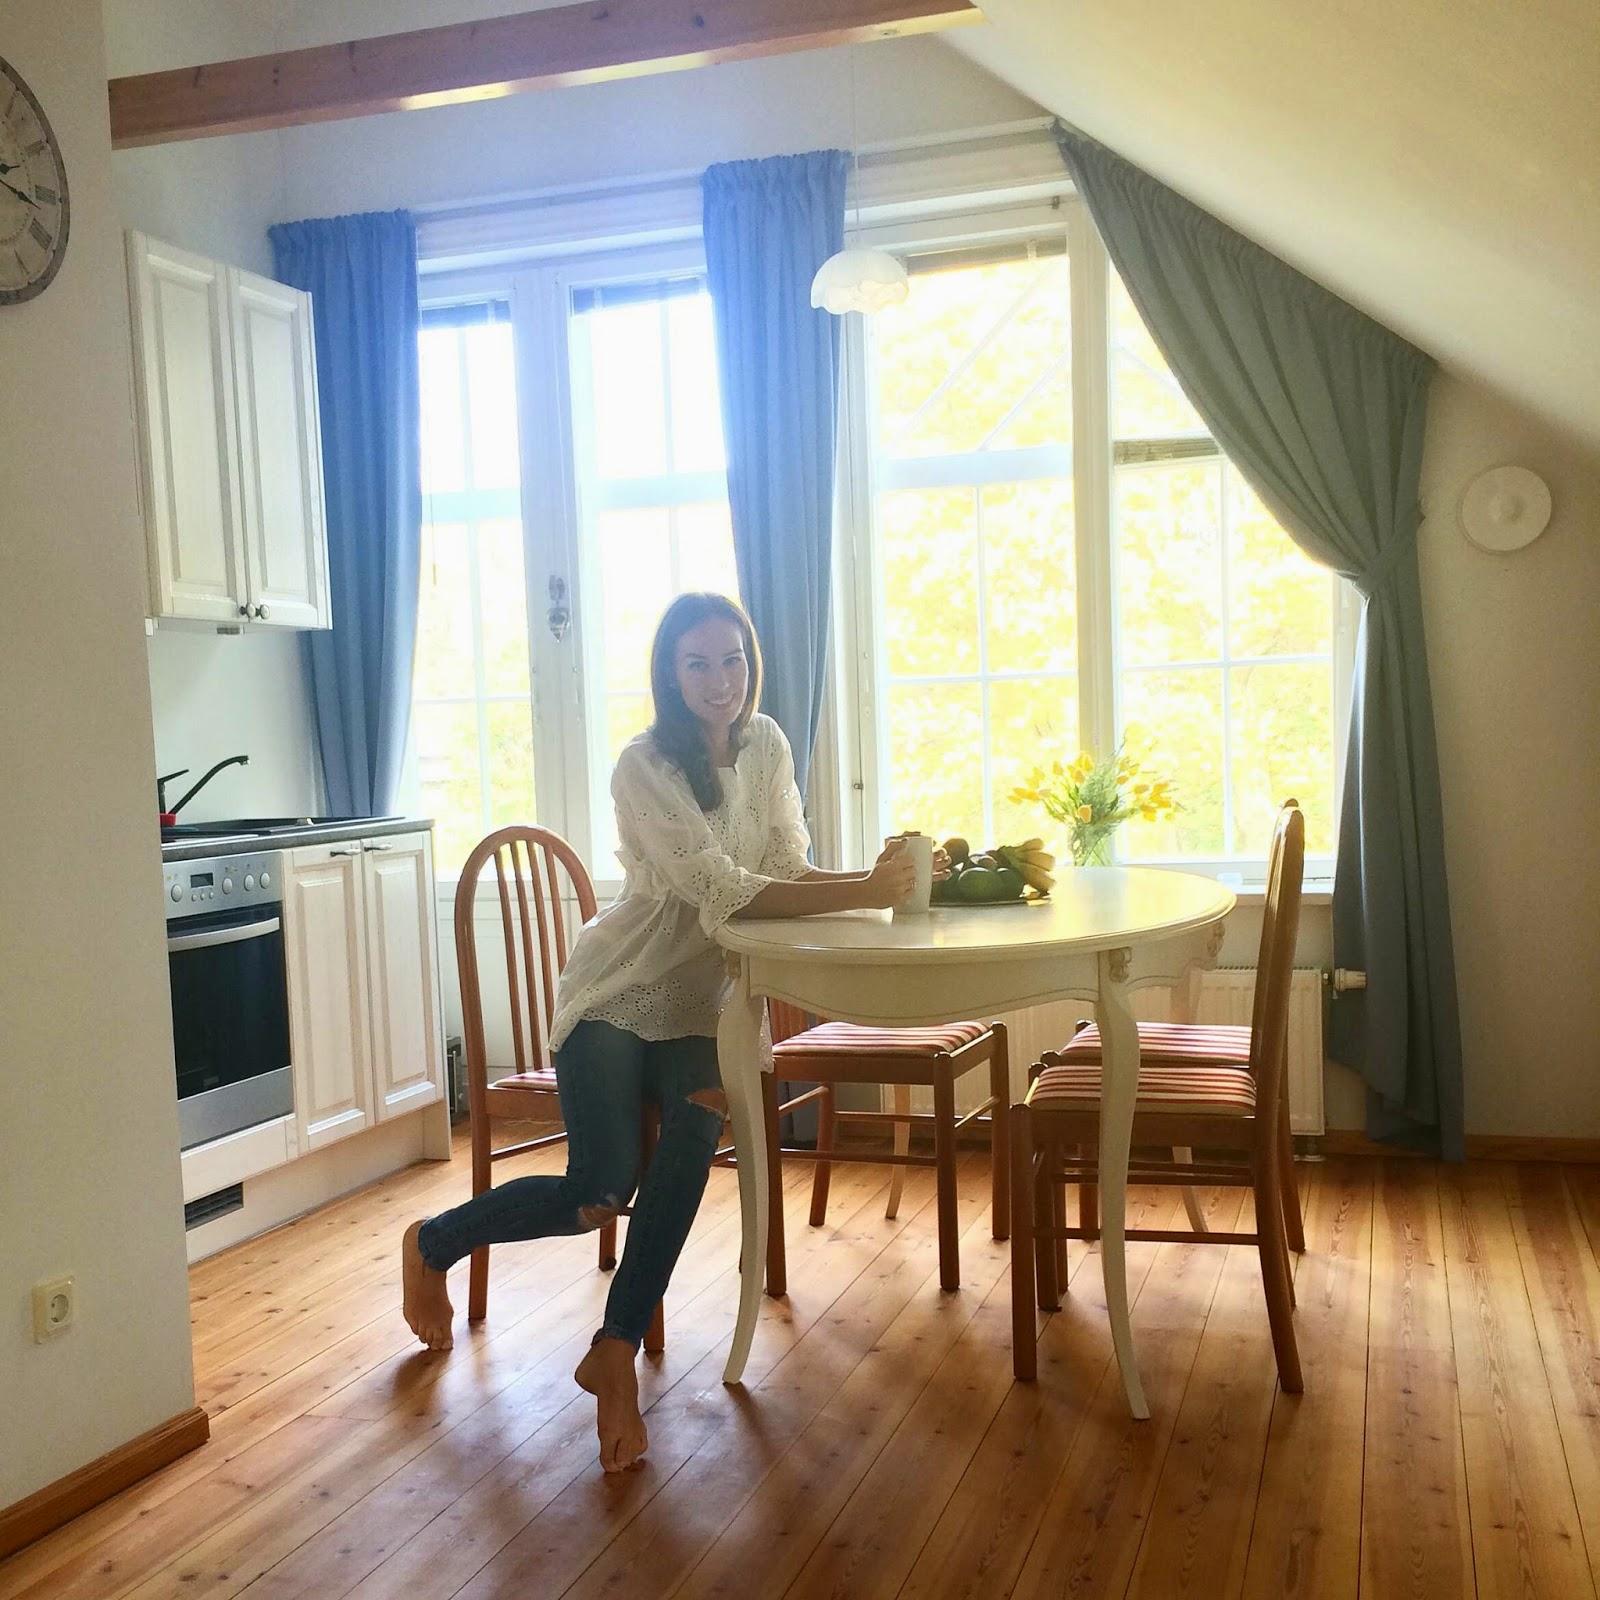 white-kitchen-wood-floor-large-windows